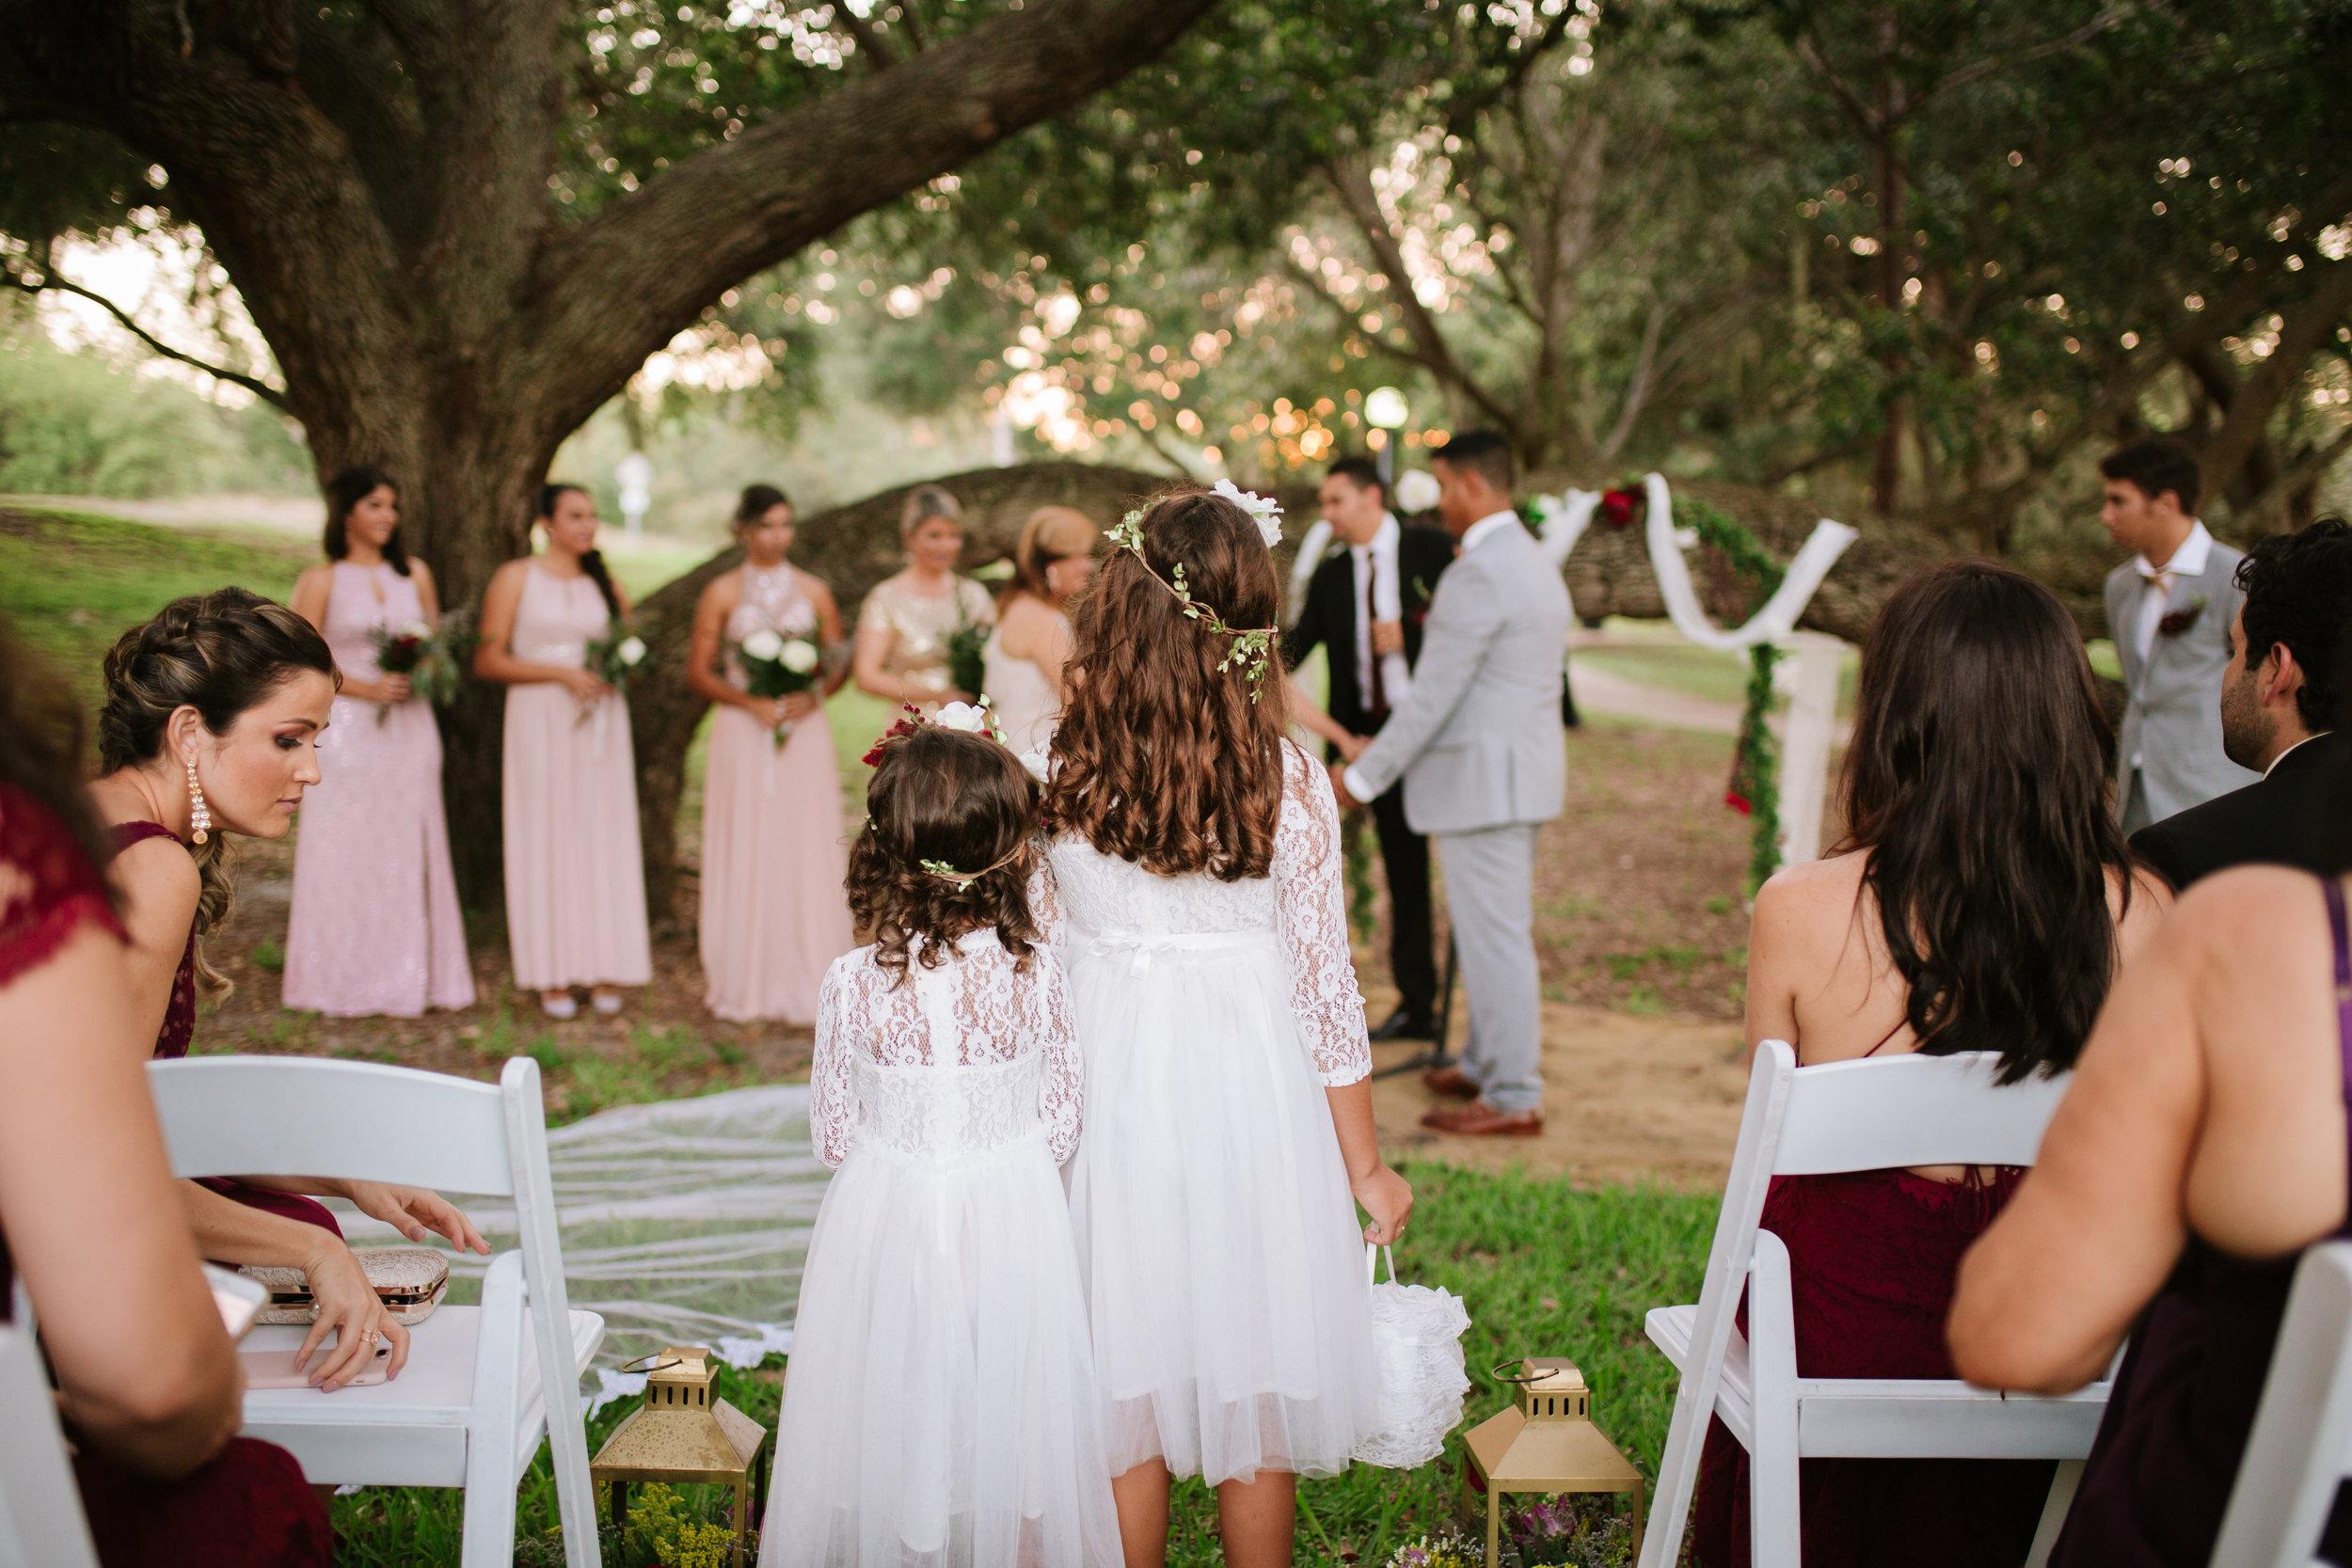 2017.05.23 Barbara and Mauricio Sales Port St Lucie Wedding (372 of 772).jpg